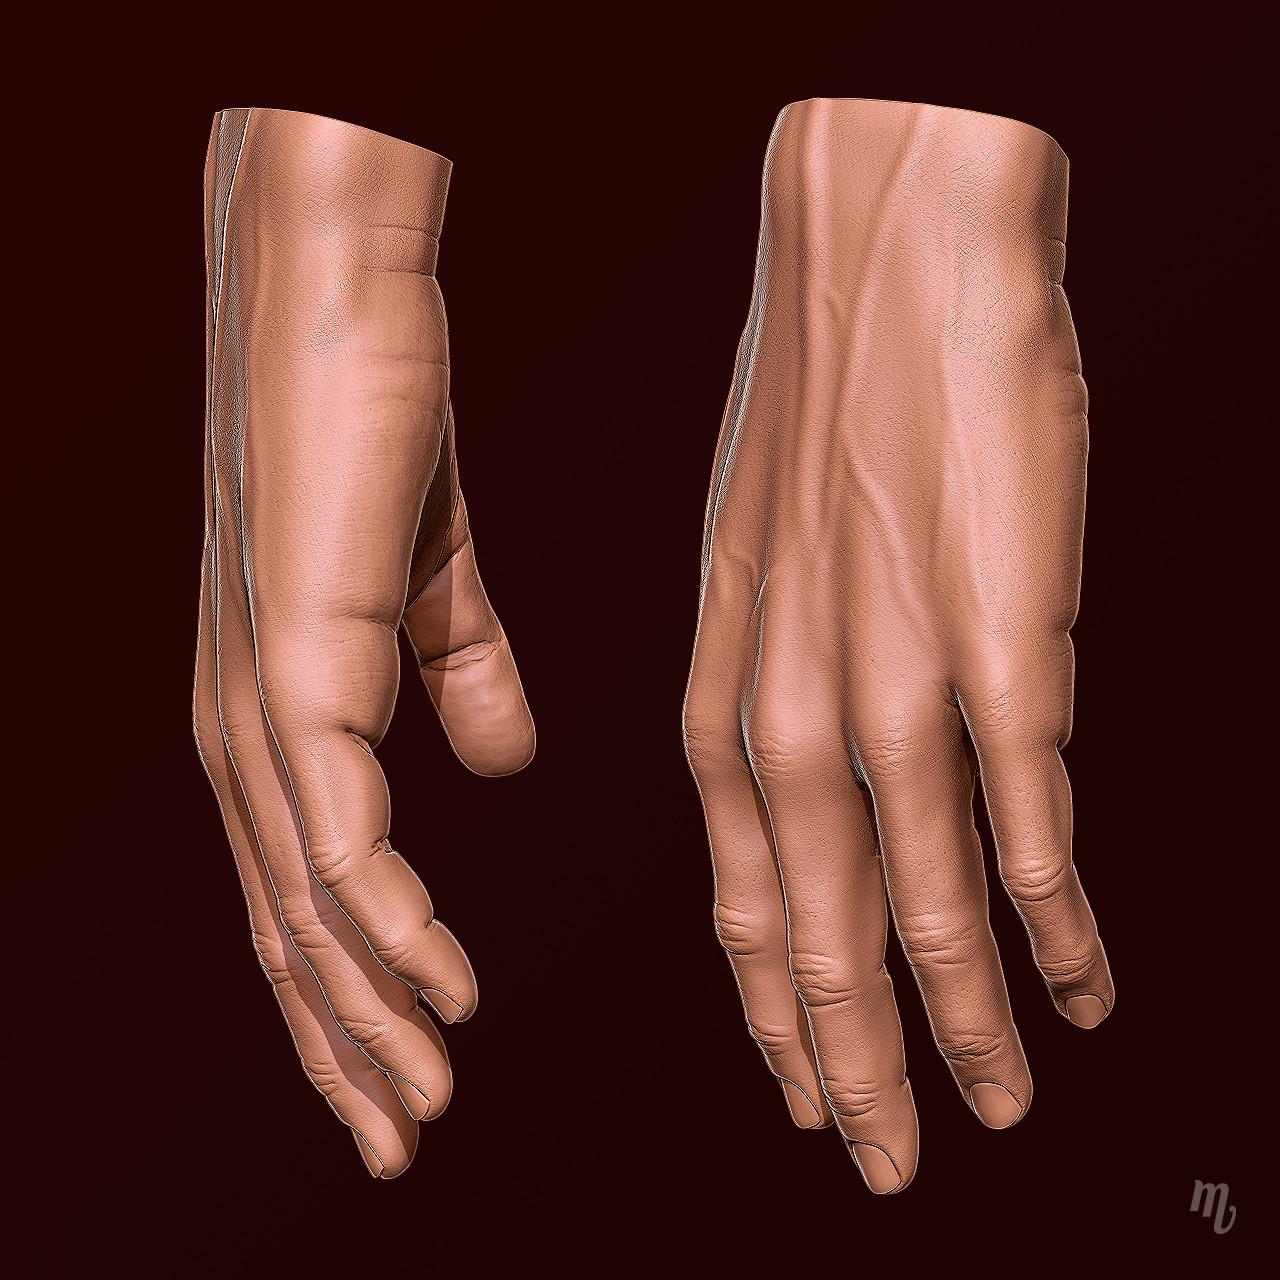 Marc virgili hand 06